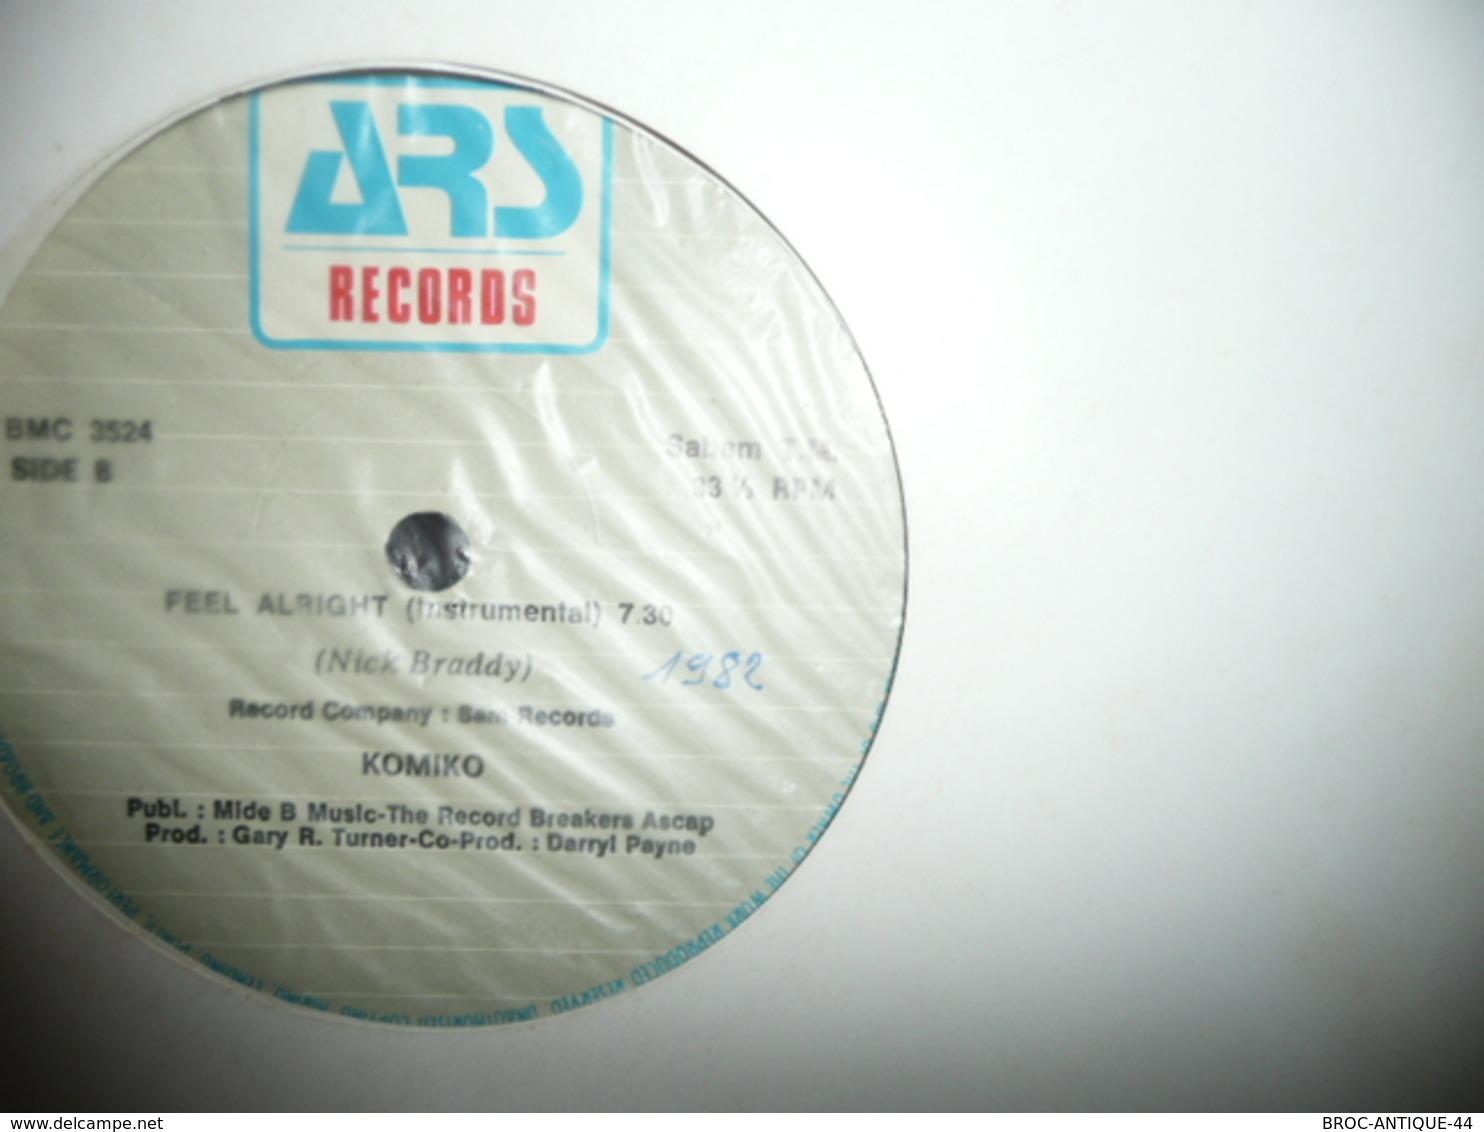 LP33 N°4168 - KOMIKO - FEEL ALRIGHT - ELECTRO FUNK SOUL DISCO - 45 Toeren - Maxi-Single